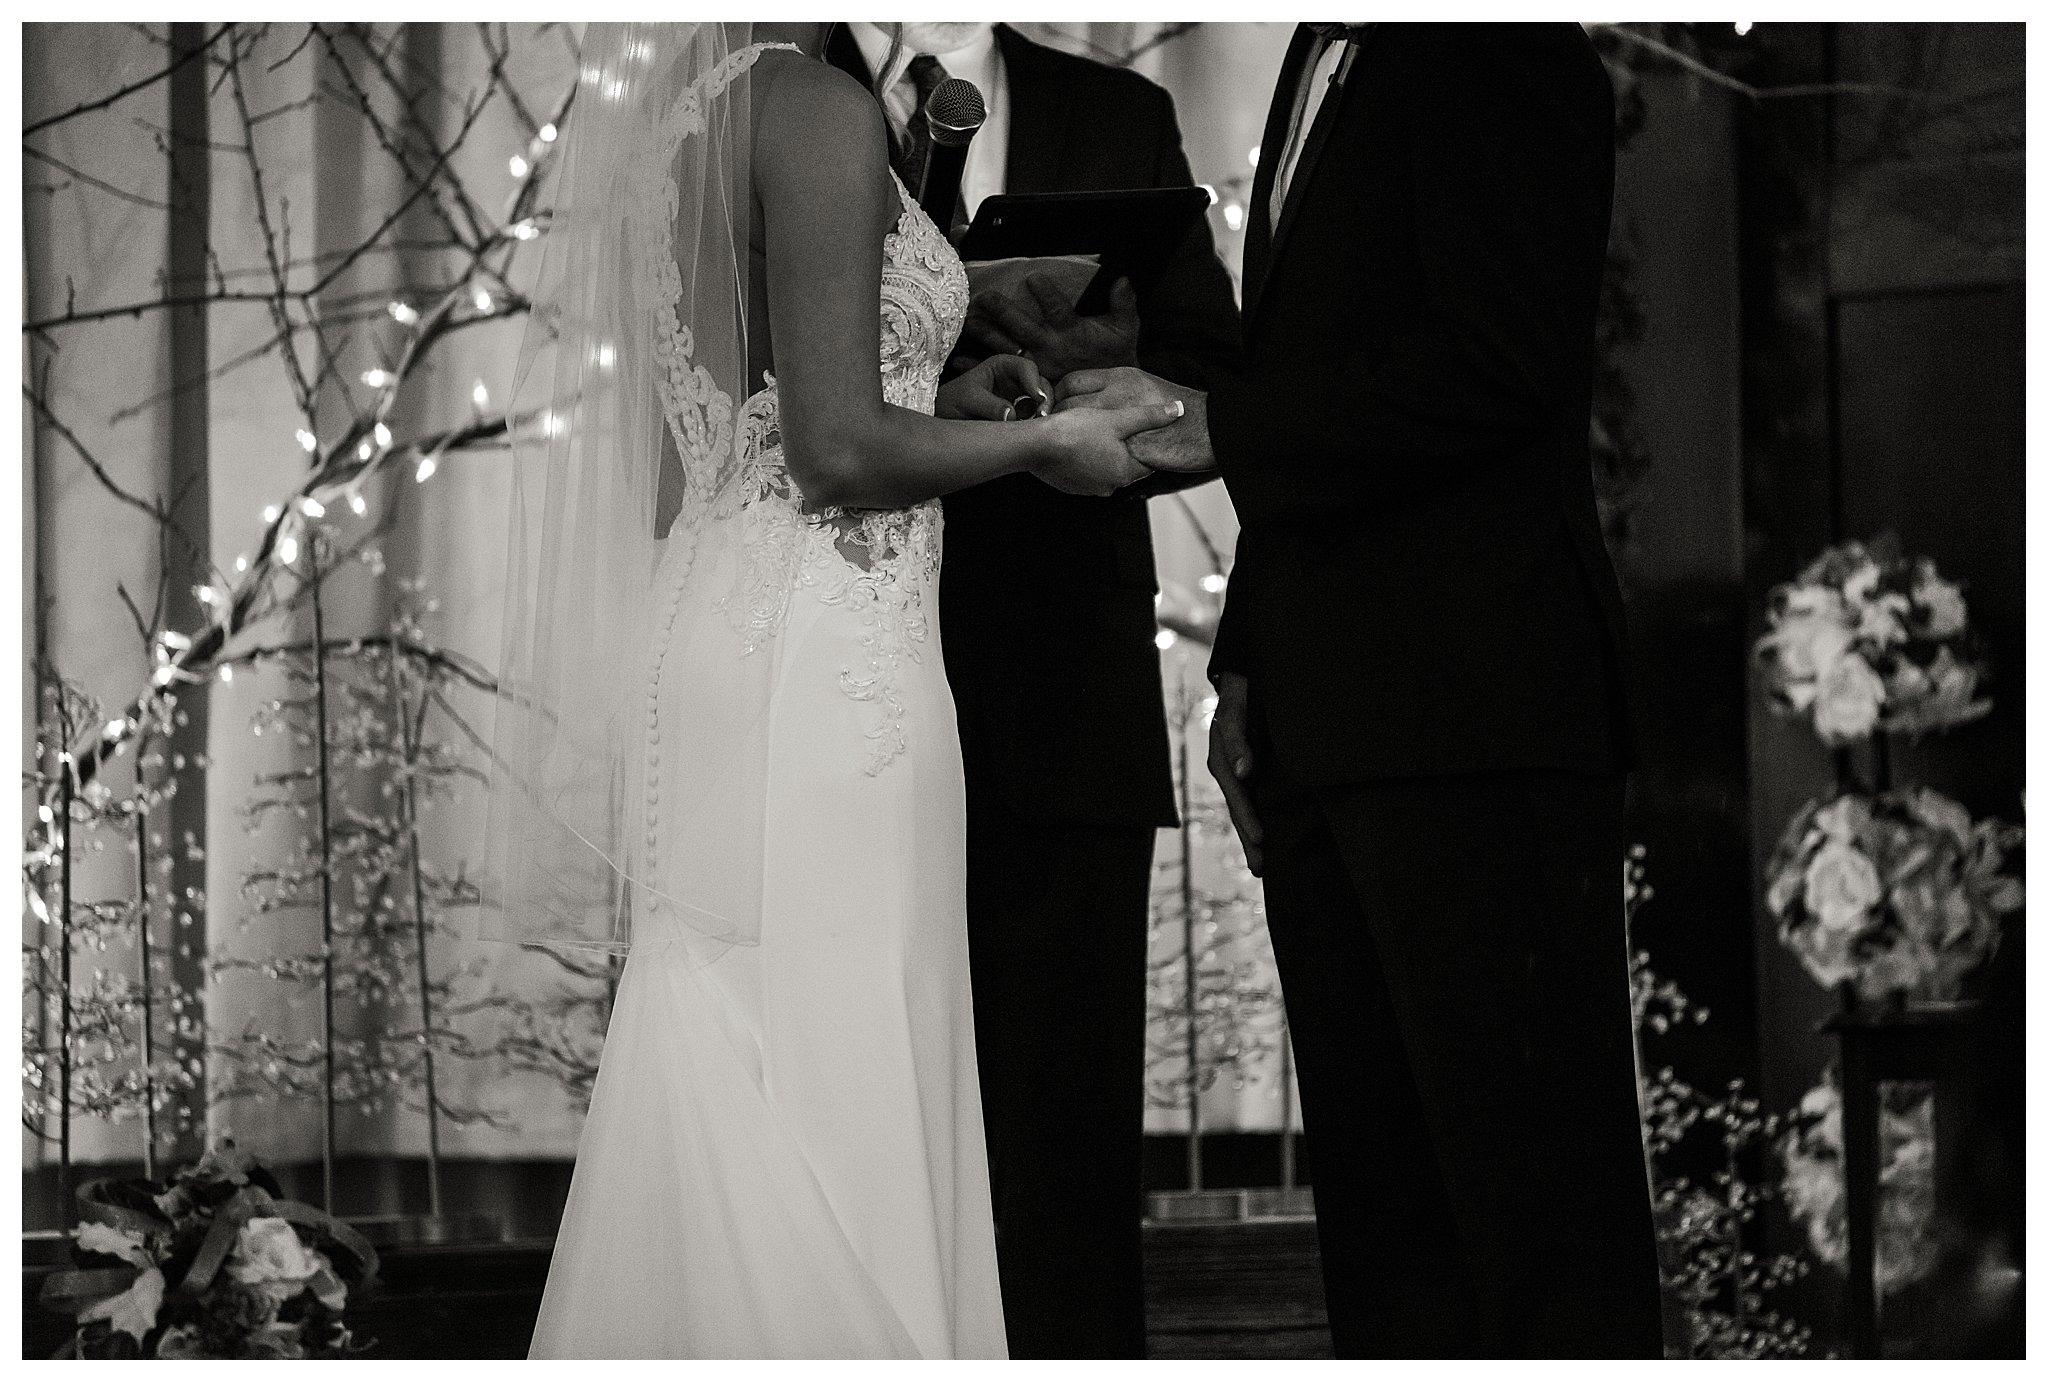 Boise Wedding Photographer, Idaho Wedding Photographer, candlelit wedding, plum and gold wedding colors, winter wedding, Indoor Photography, lace wedding dress, wedding updo, sentimental wedding ideas, documentary wedding photographer, wedding photography, large group wedding, church wedding